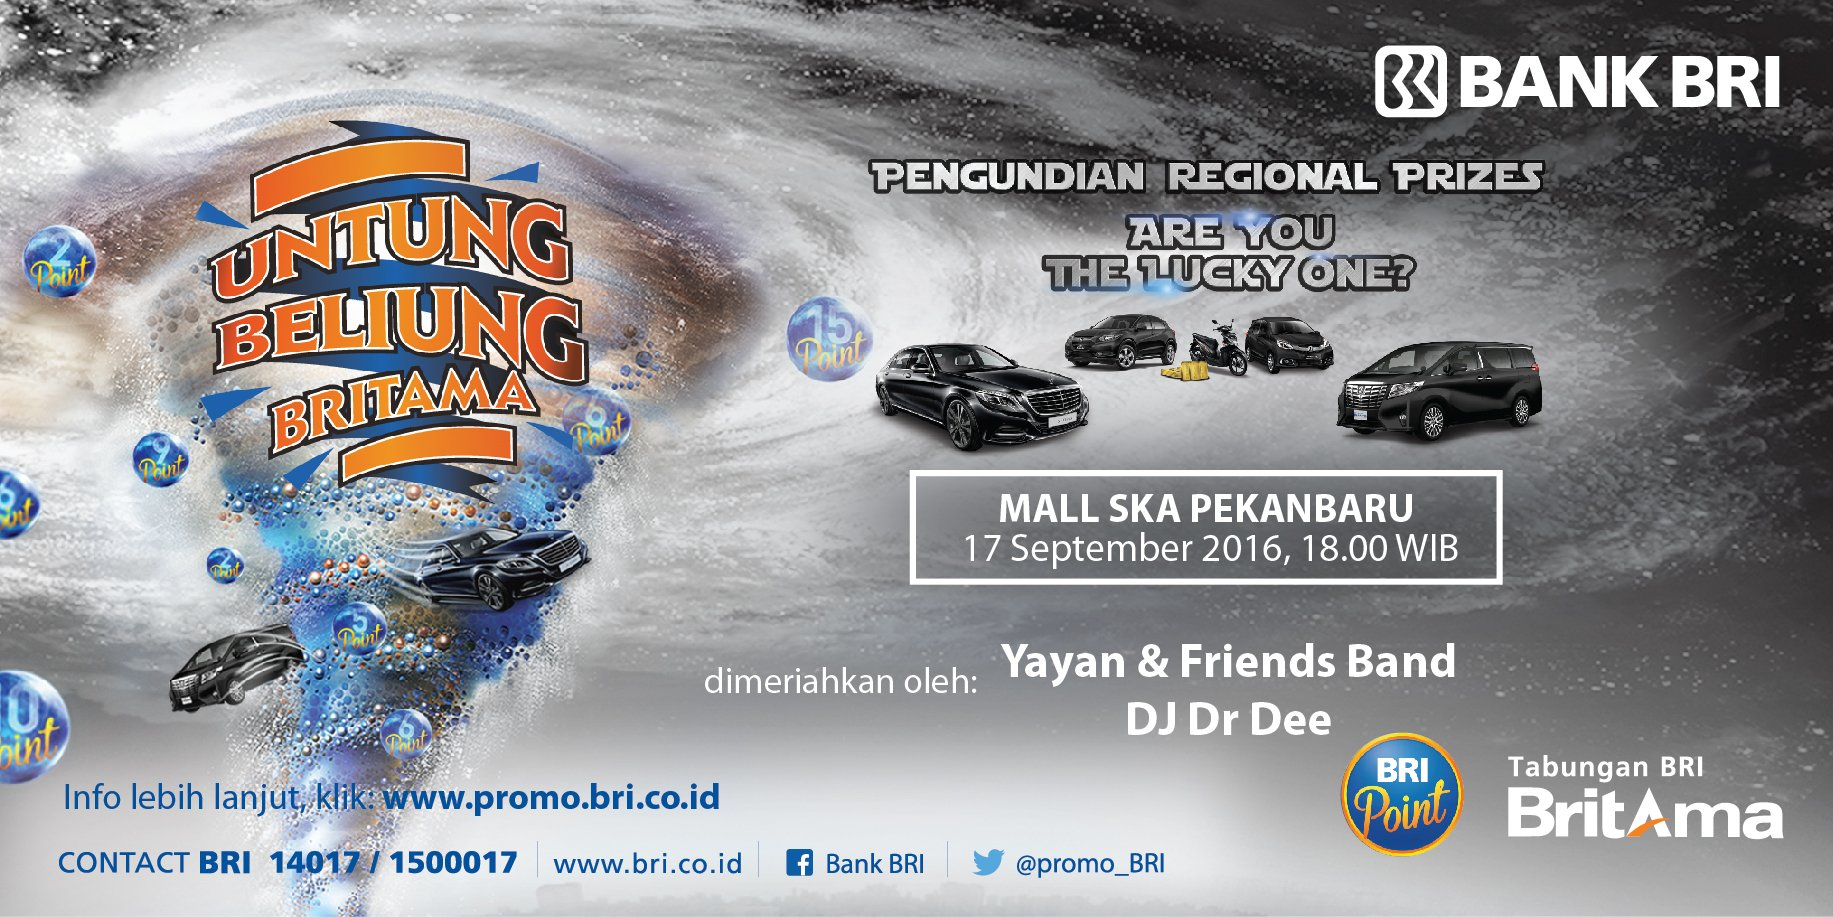 Halo #sahabatBRI di Kota Pekanbaru,Ayo saksikan Pengundian Regional Prize UBB IX di Mall SKA hr ini pkl 18.00 WIB https://t.co/kgvVTlW6Sx